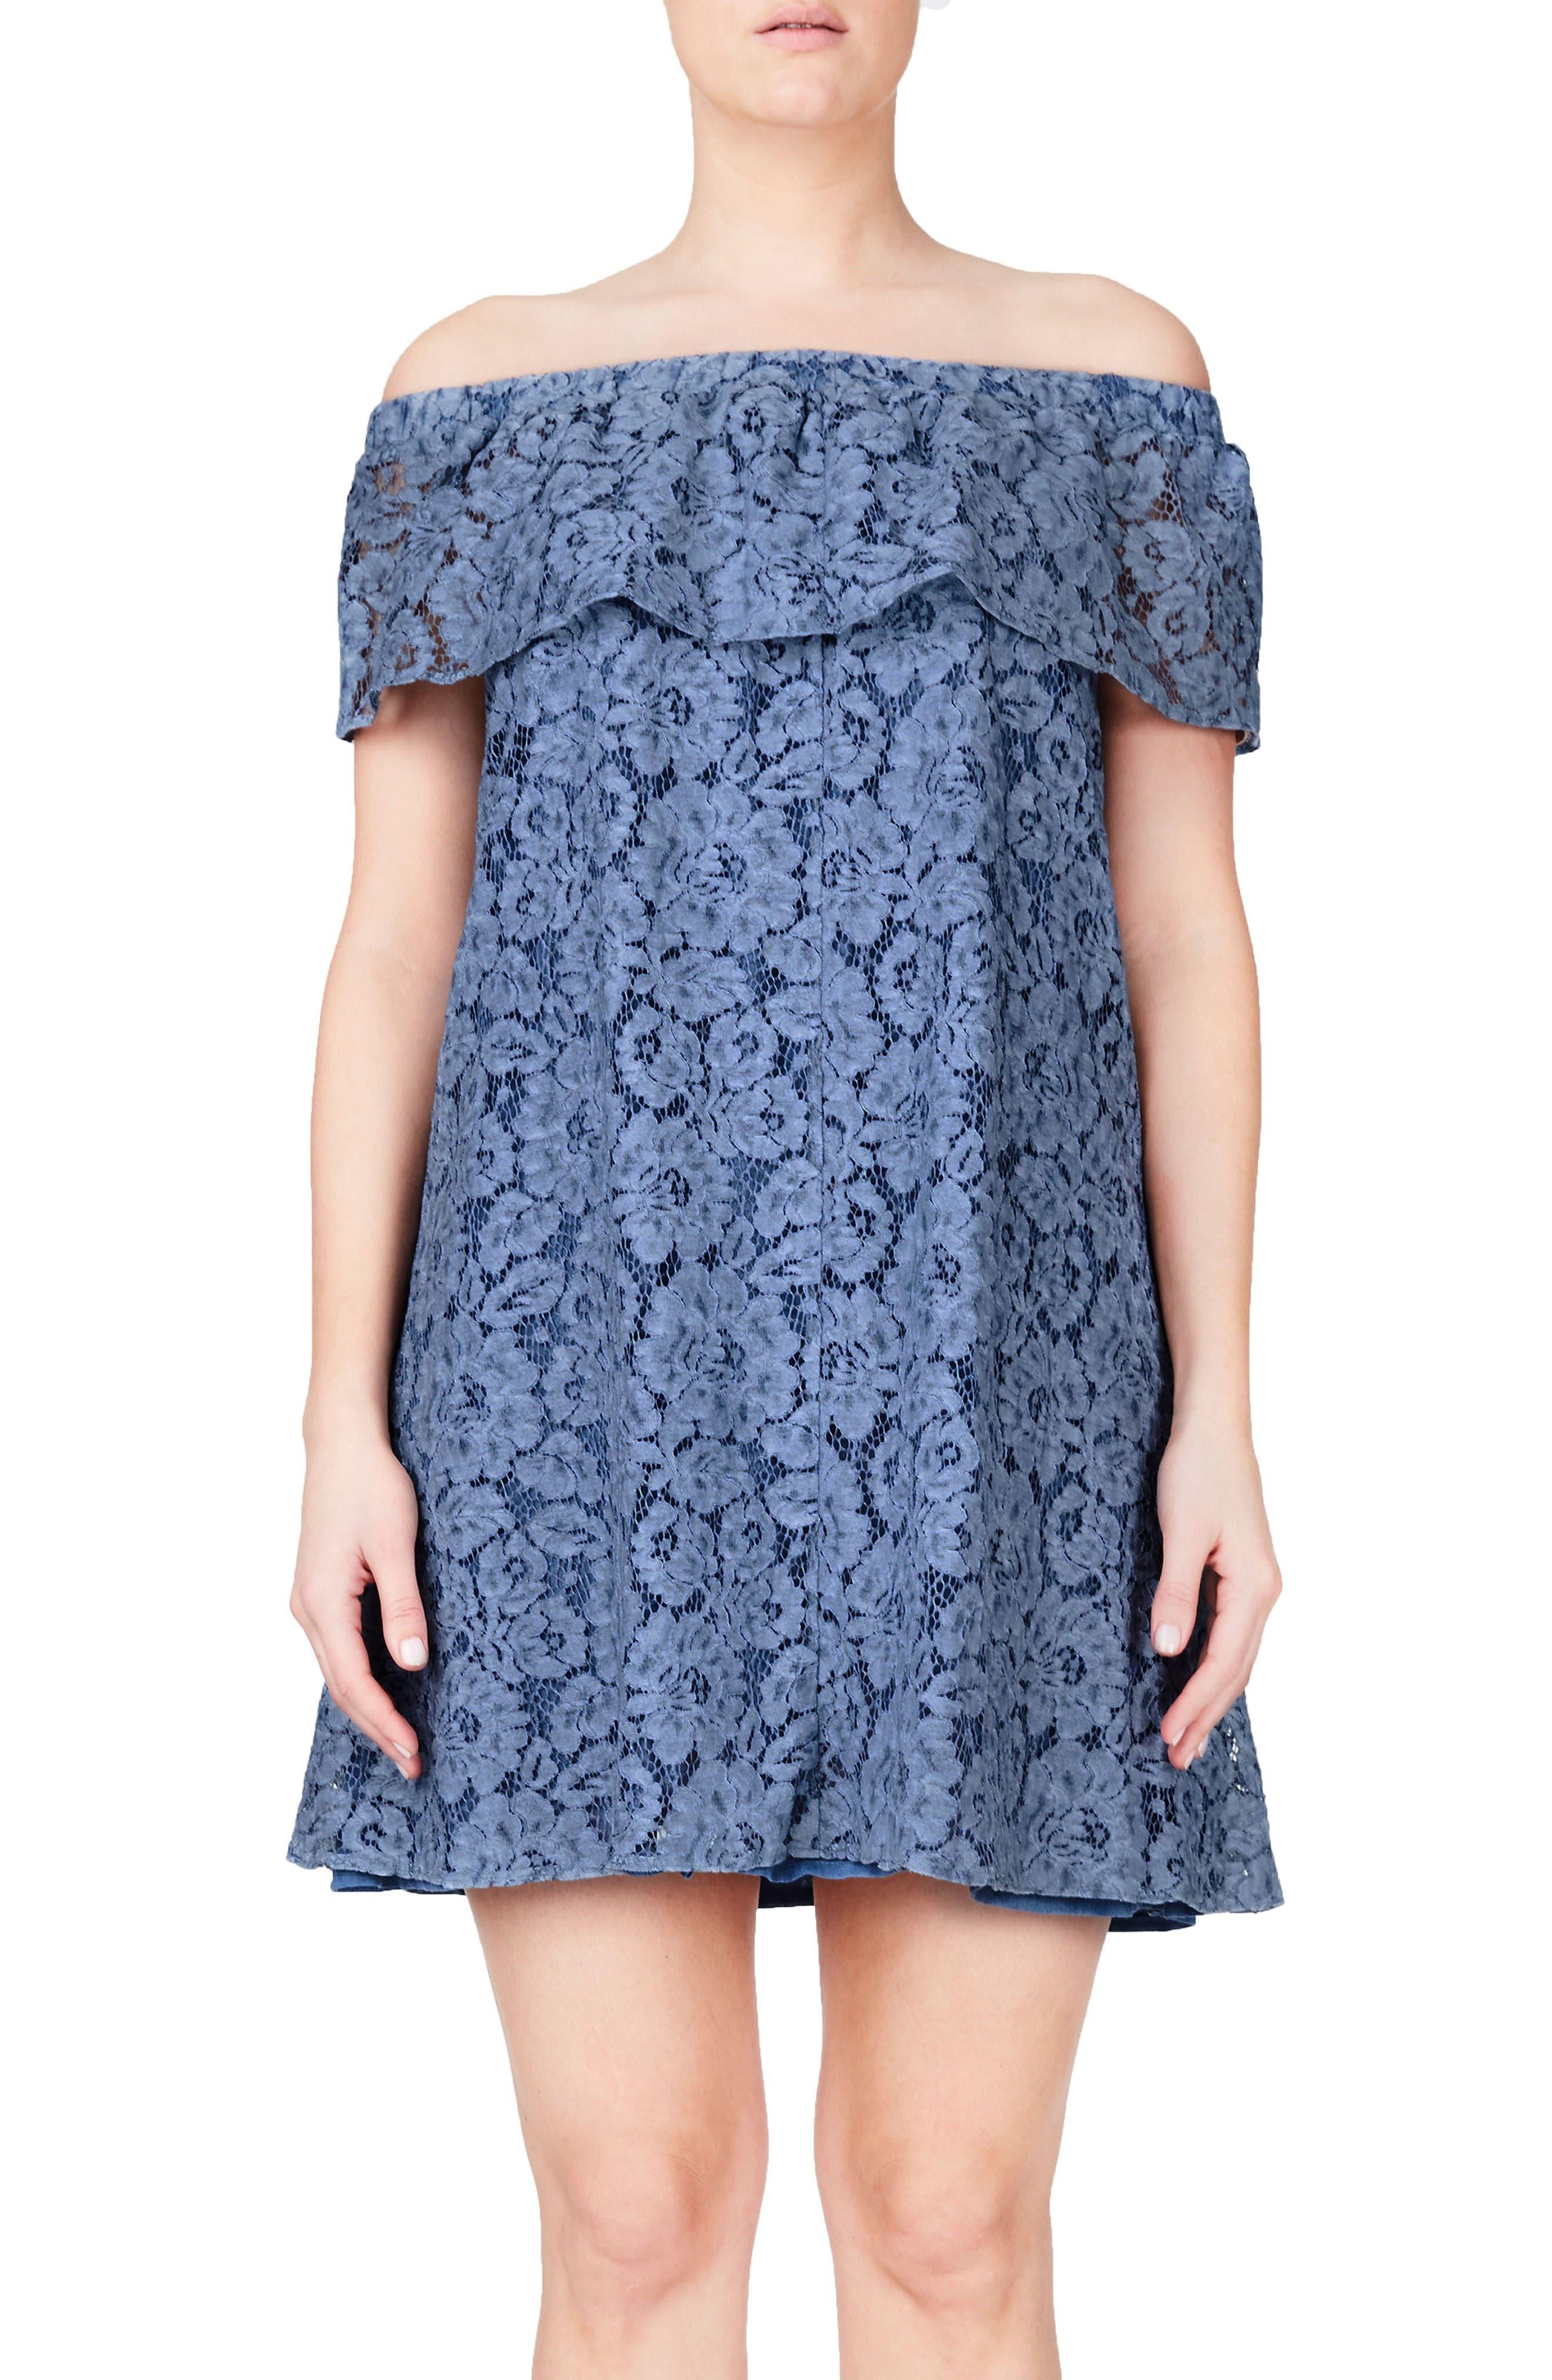 ELVI Bardot Lace Off the Shoulder A-Line Dress